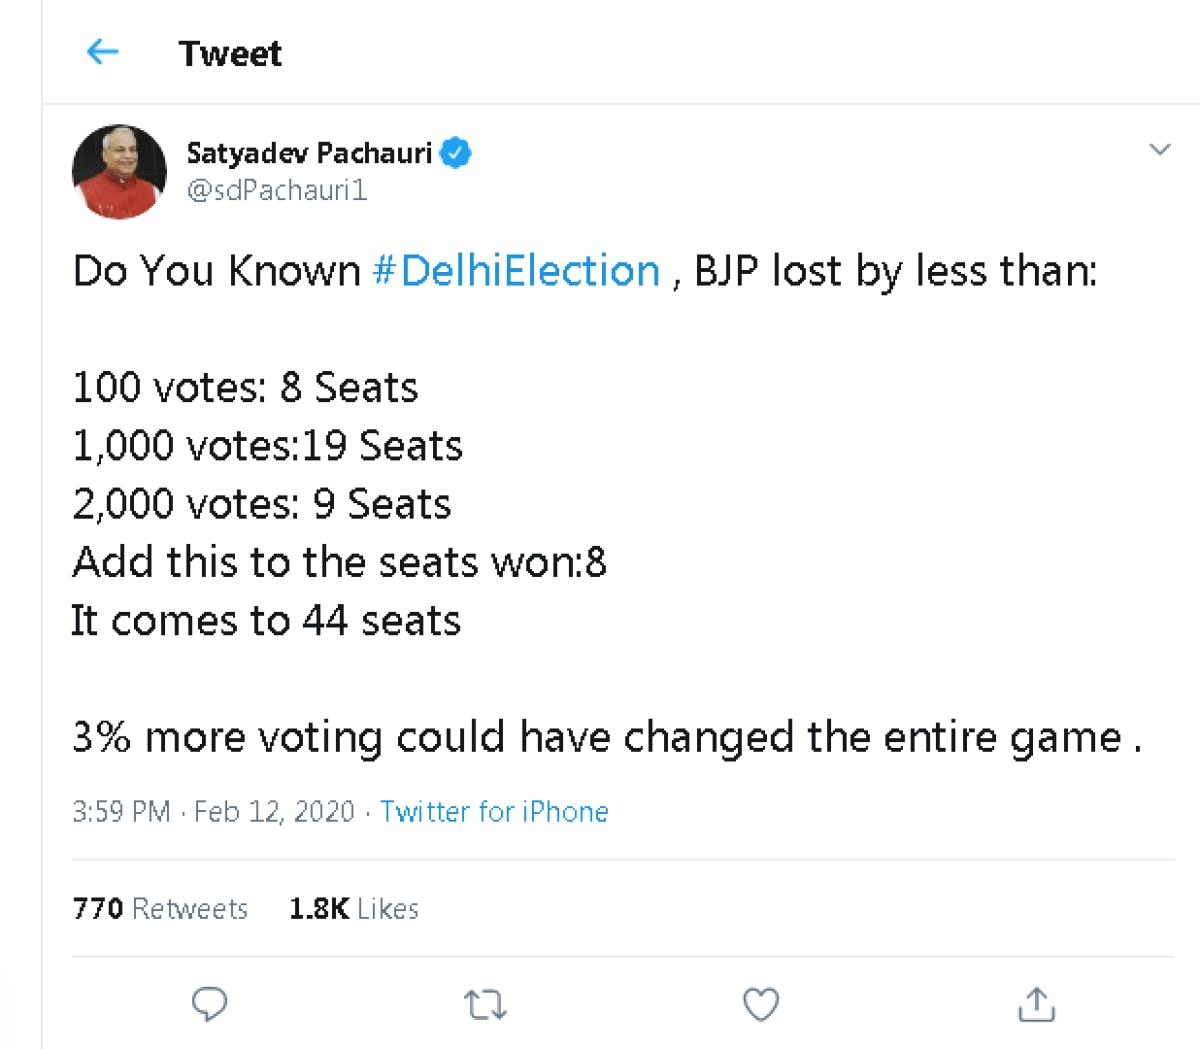 BJP MP Satyadev Pachauri falls for WhatsApp forward; says party lost 8 seats by 100 votes in Delhi polls